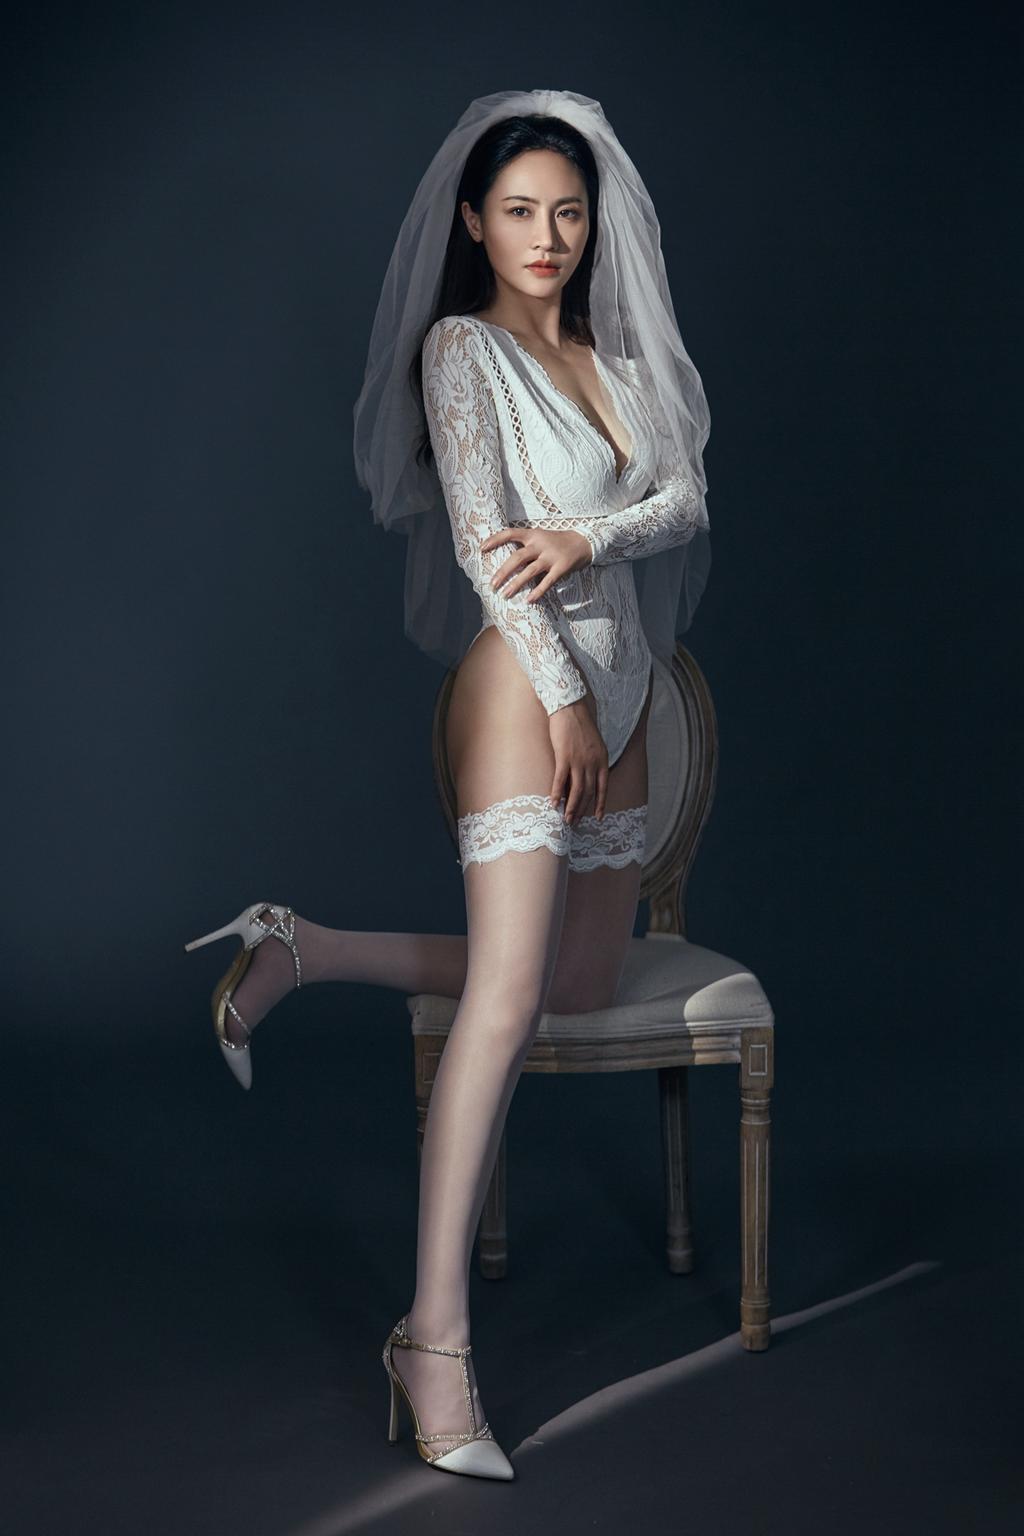 《Sexy Wedding Dress》性感婚纱写真图片